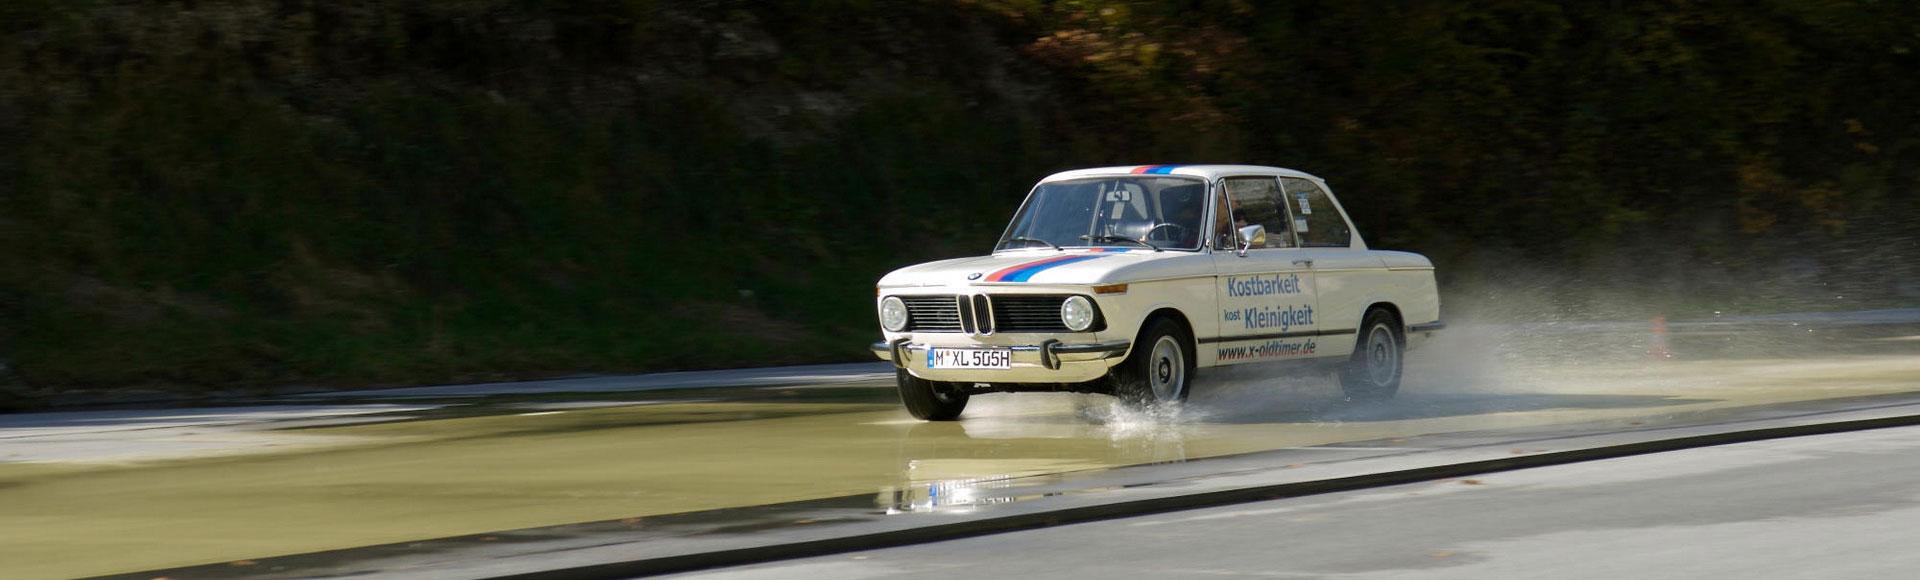 BMW 2002 Tii Sommer 07440